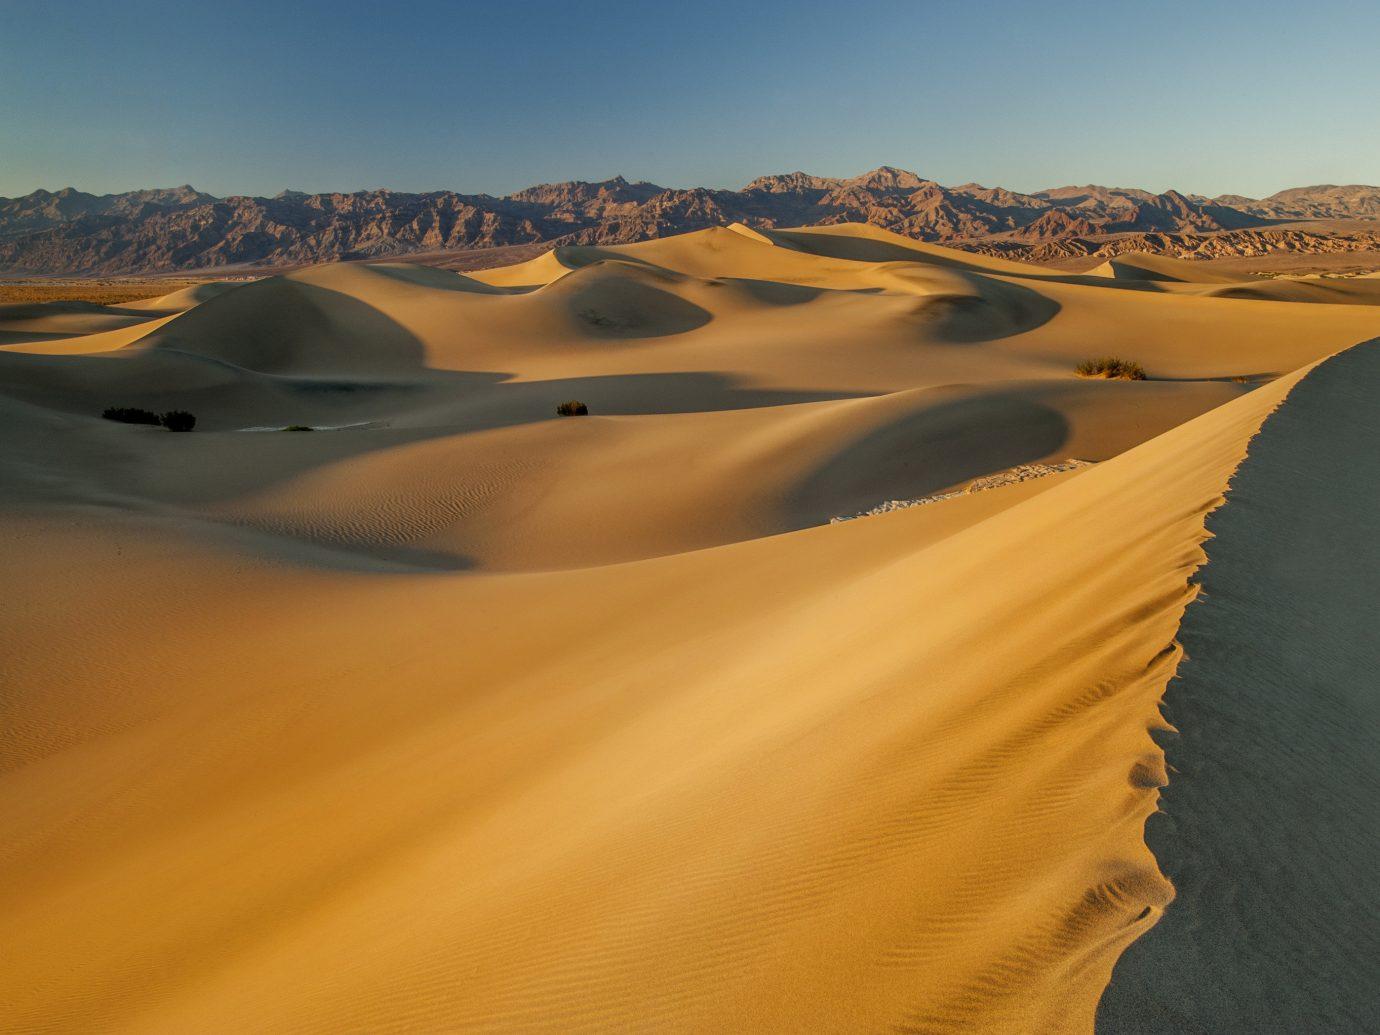 Natural wonders Scenic views Trip Ideas sky Nature habitat erg geographical feature natural environment outdoor landform aeolian landform Desert landscape sand dune